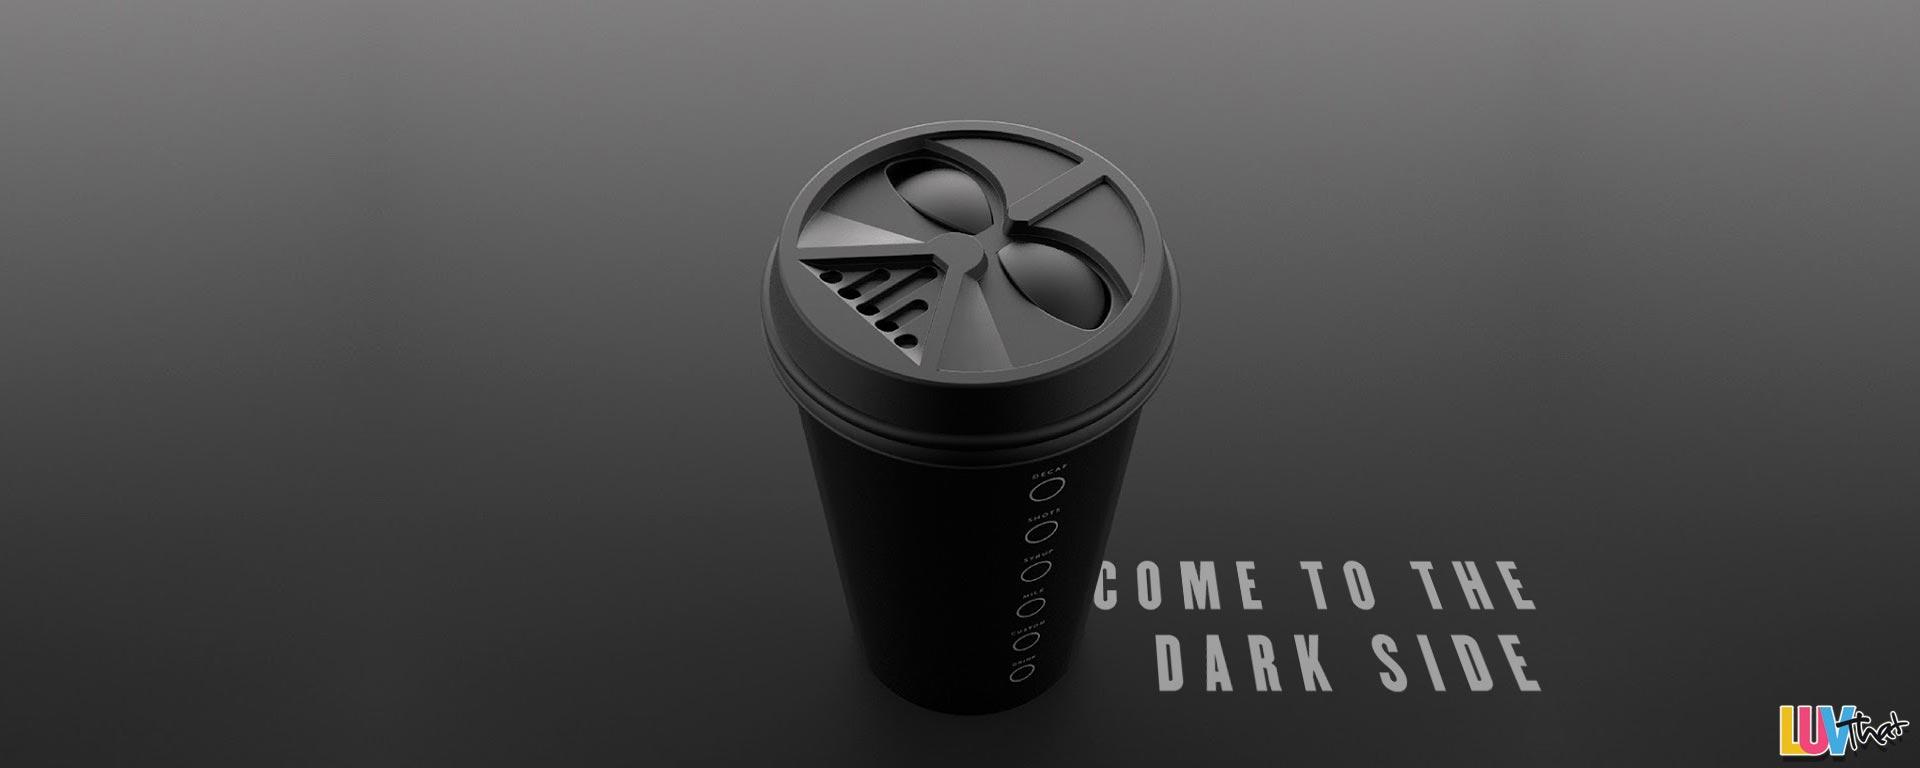 Darth Vader Coffee Cup Lid